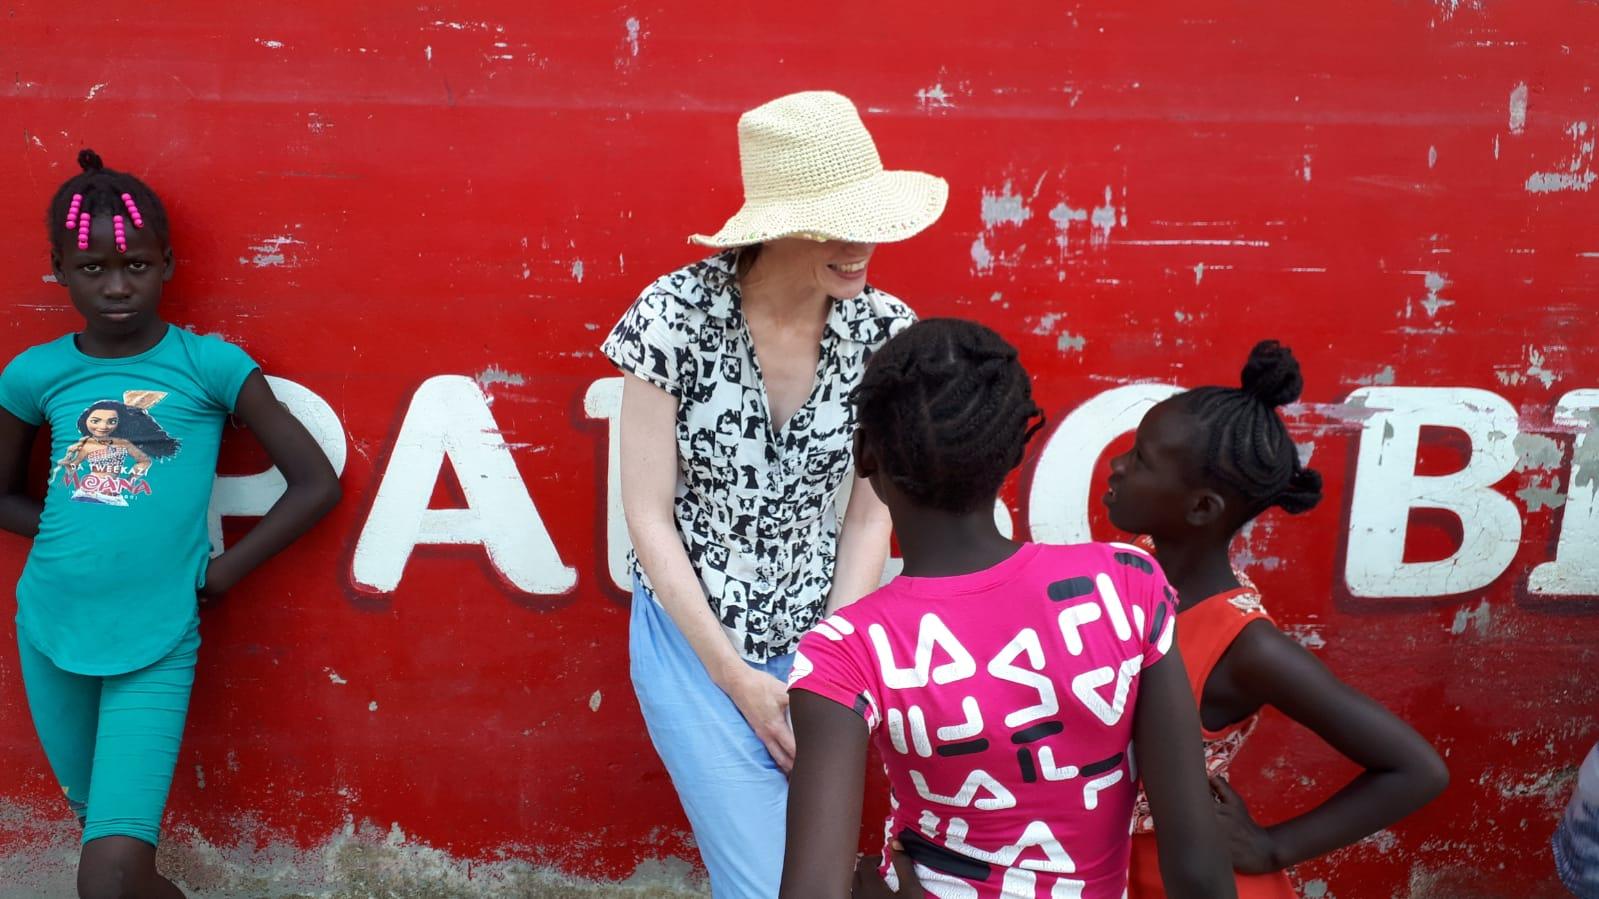 Sofia Opfer Atjoni Suriname